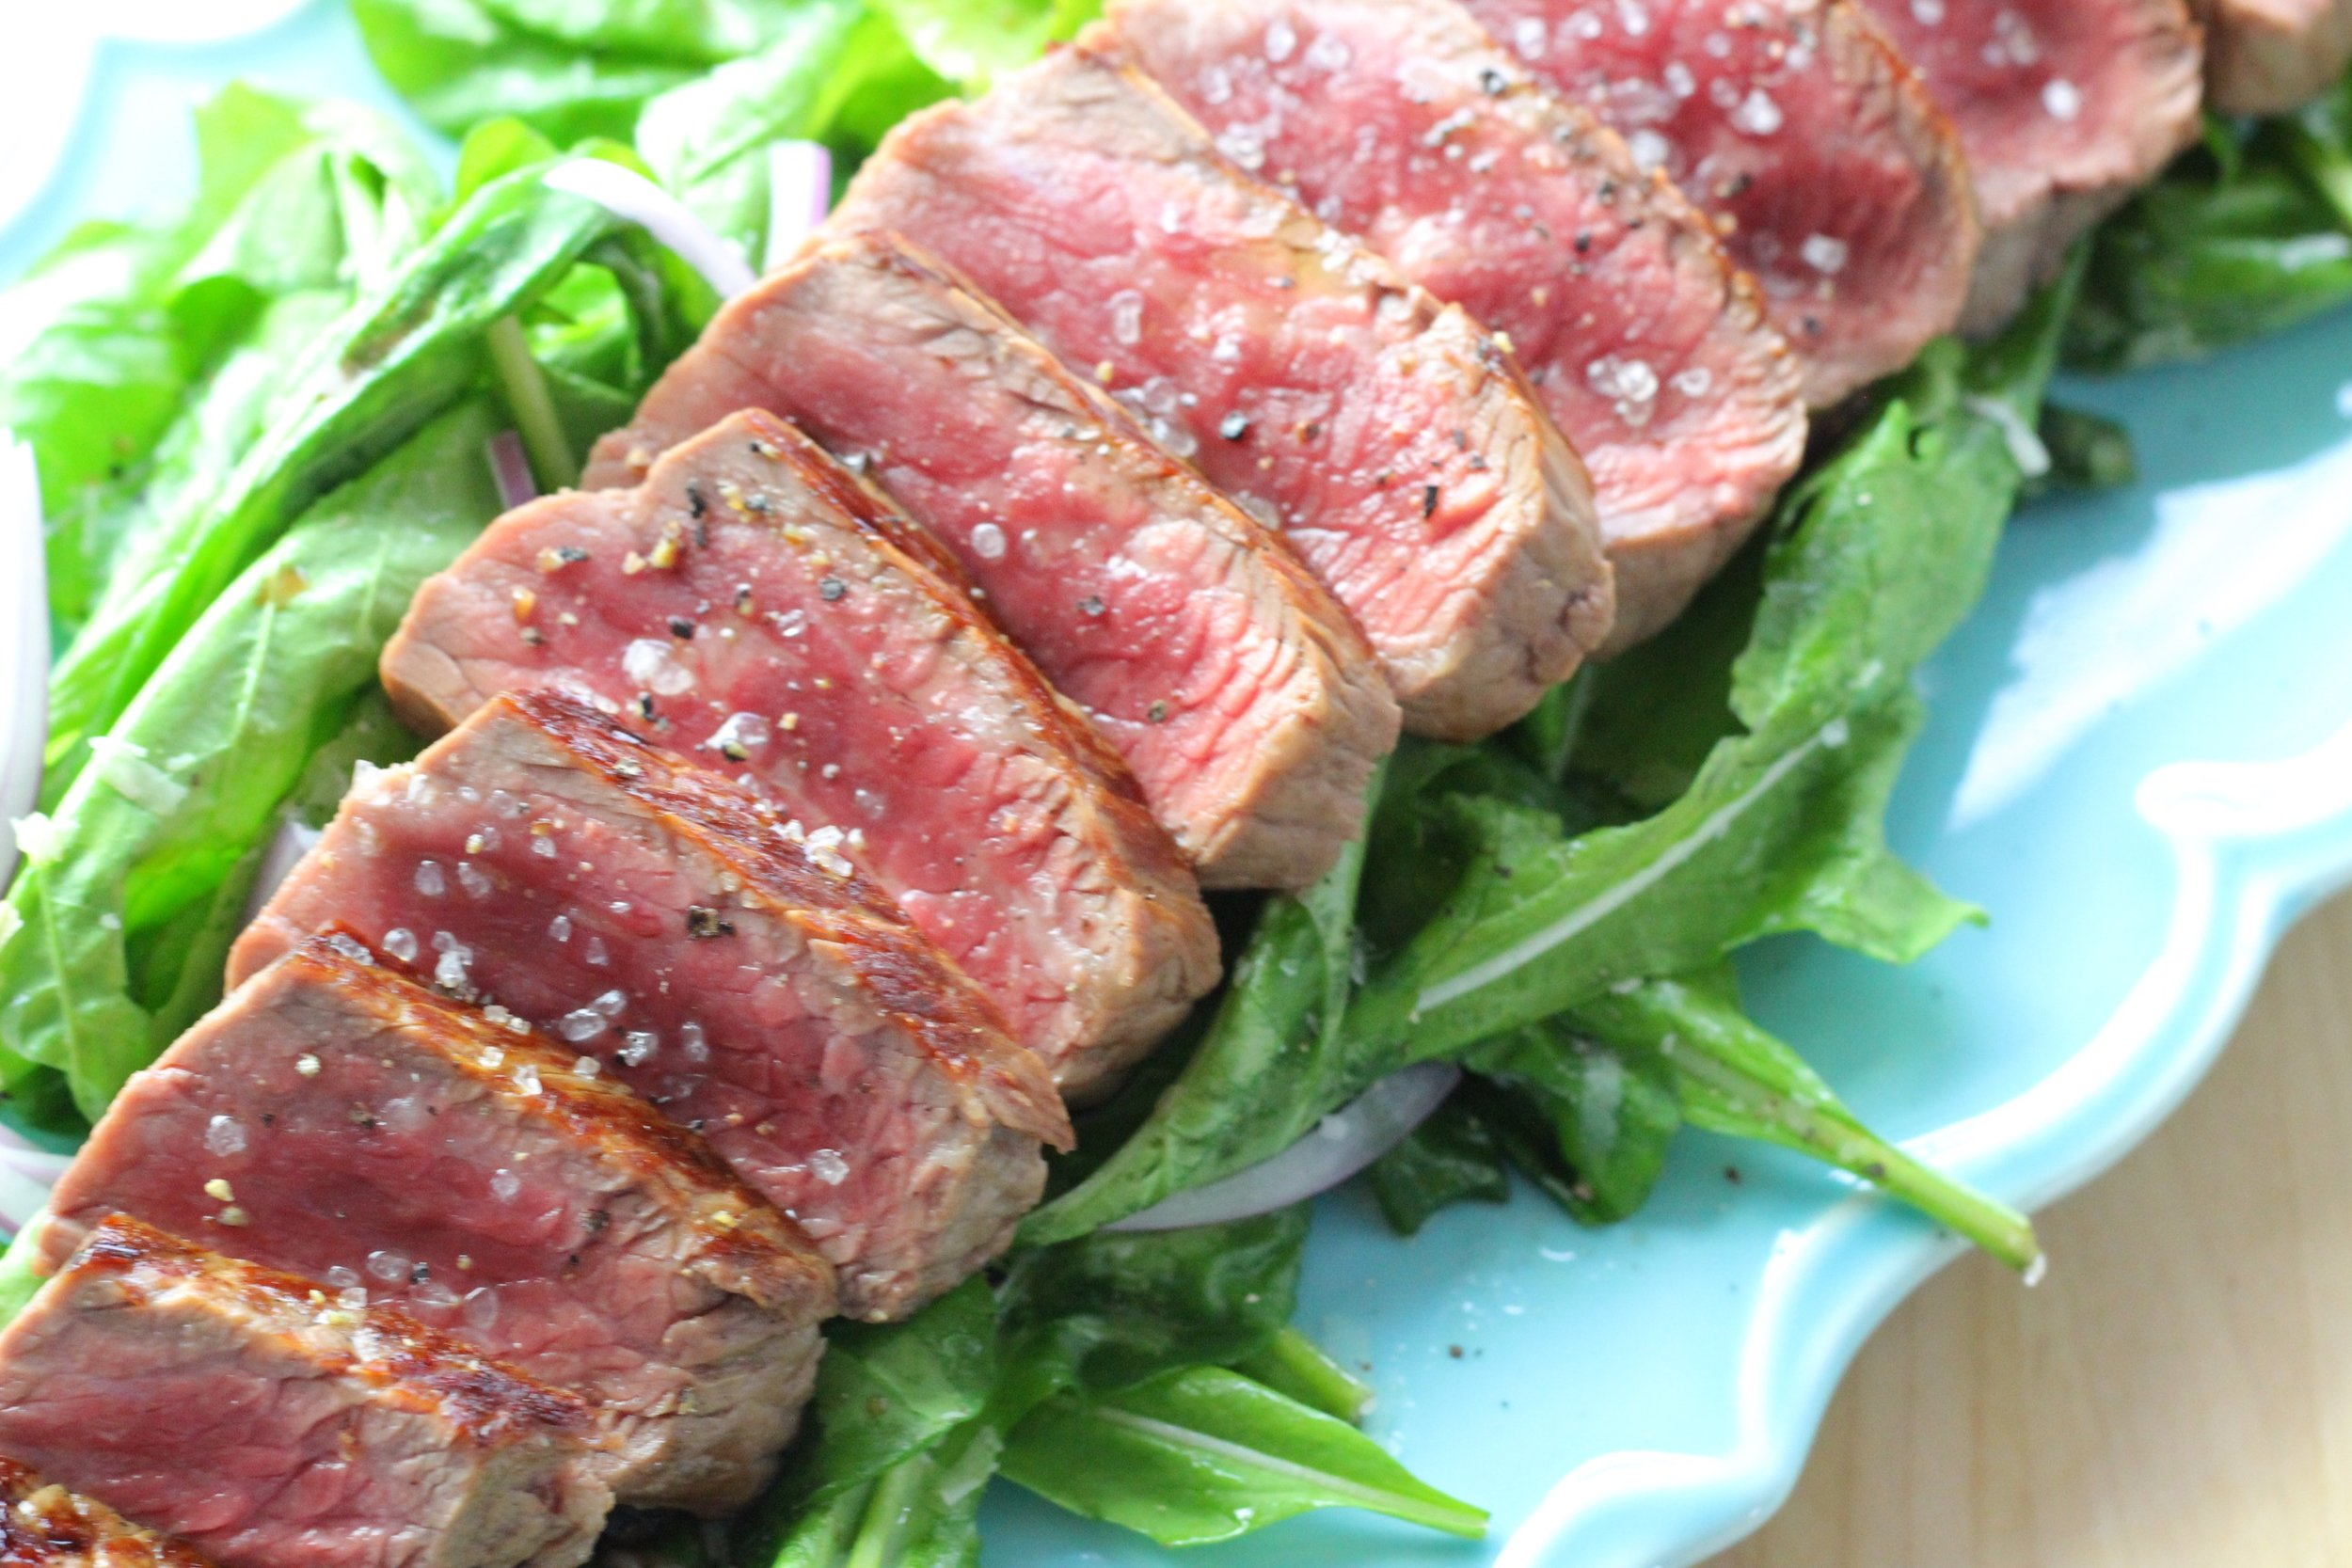 Carriage House Cooking School_Steak Tagliata.png